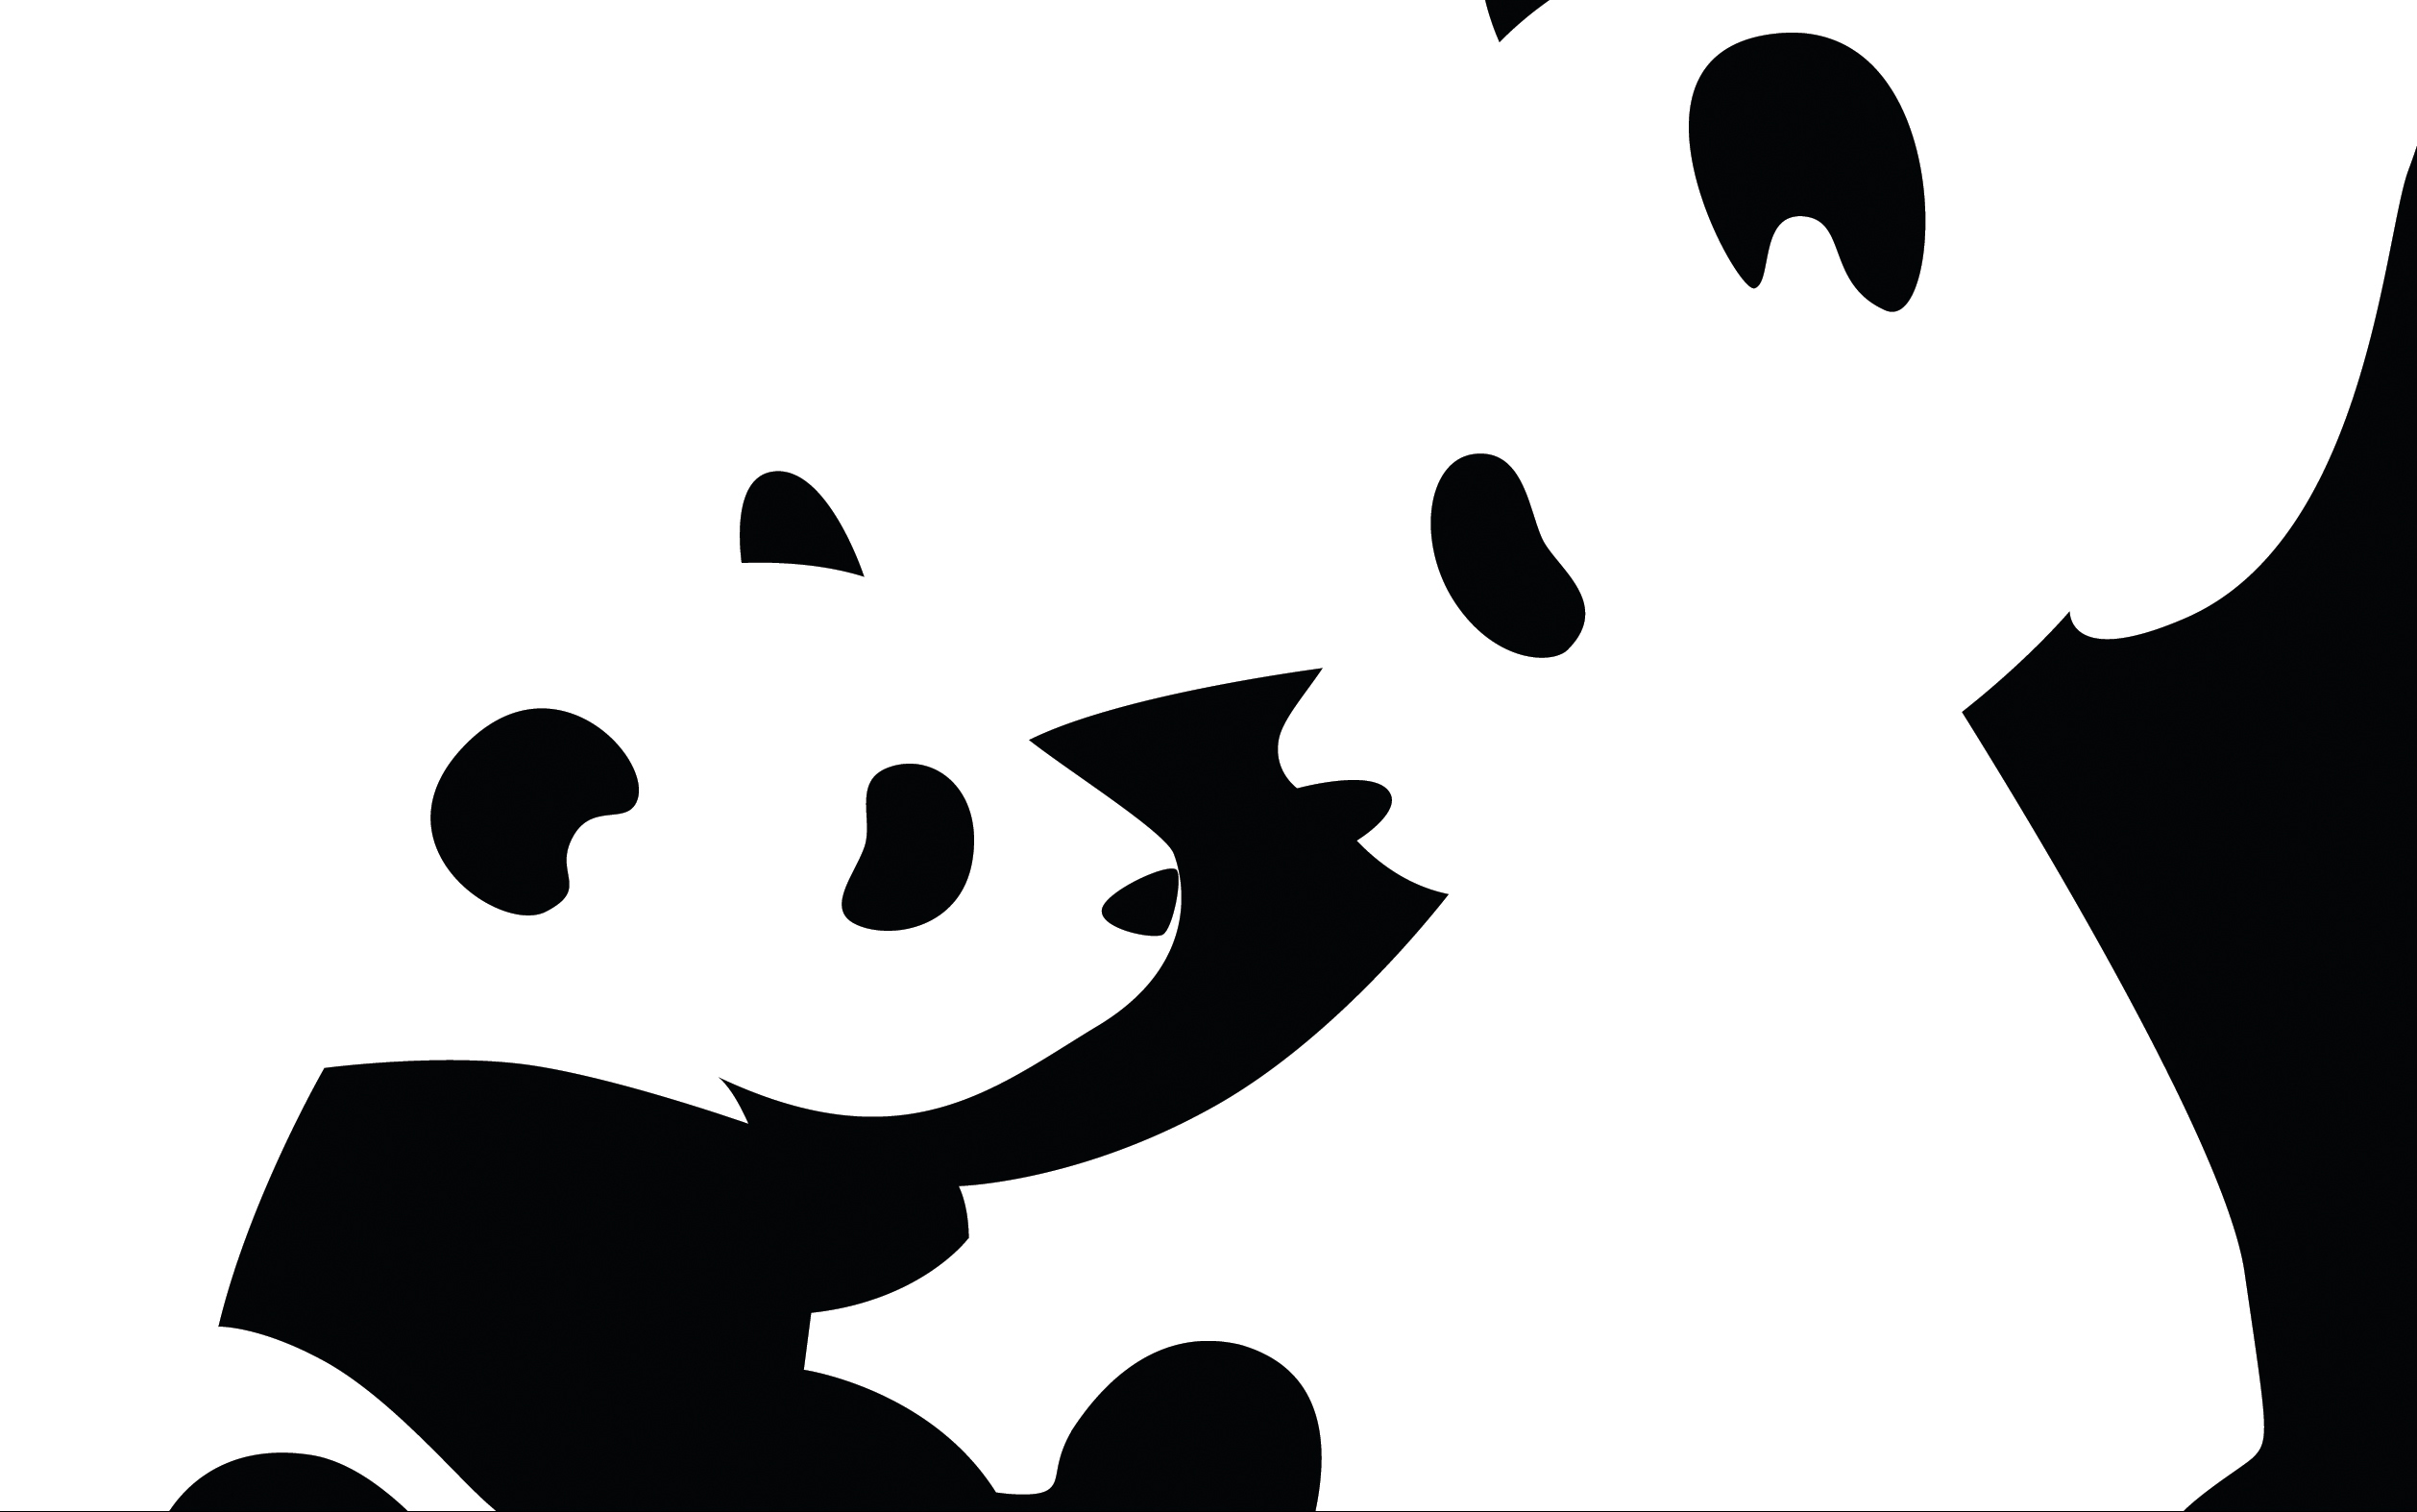 2516x1574 Panda Full Hd Wallpaper And Background Image 2516x1574 Id72516